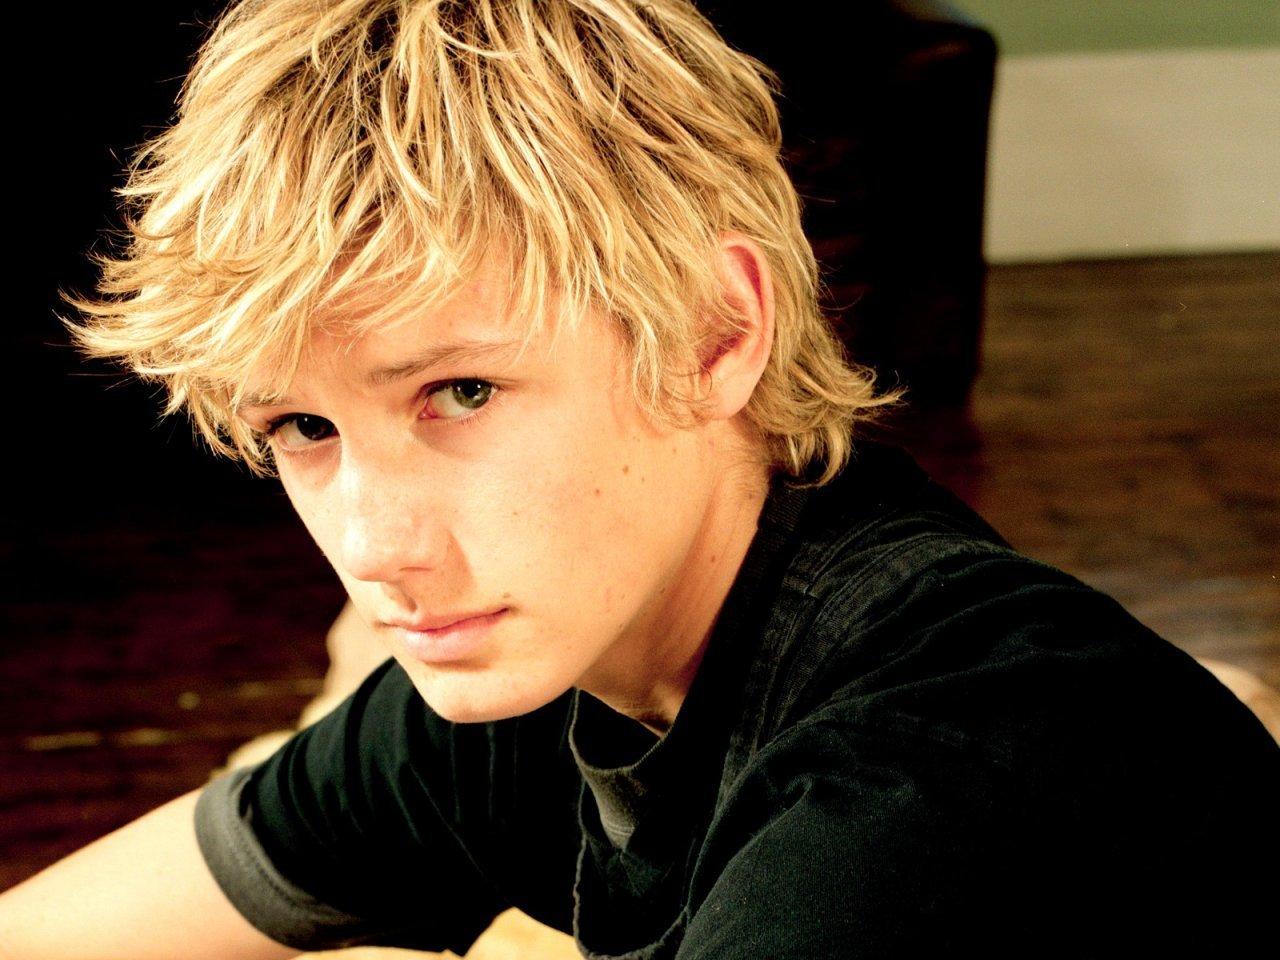 Cute guys with blonde hair